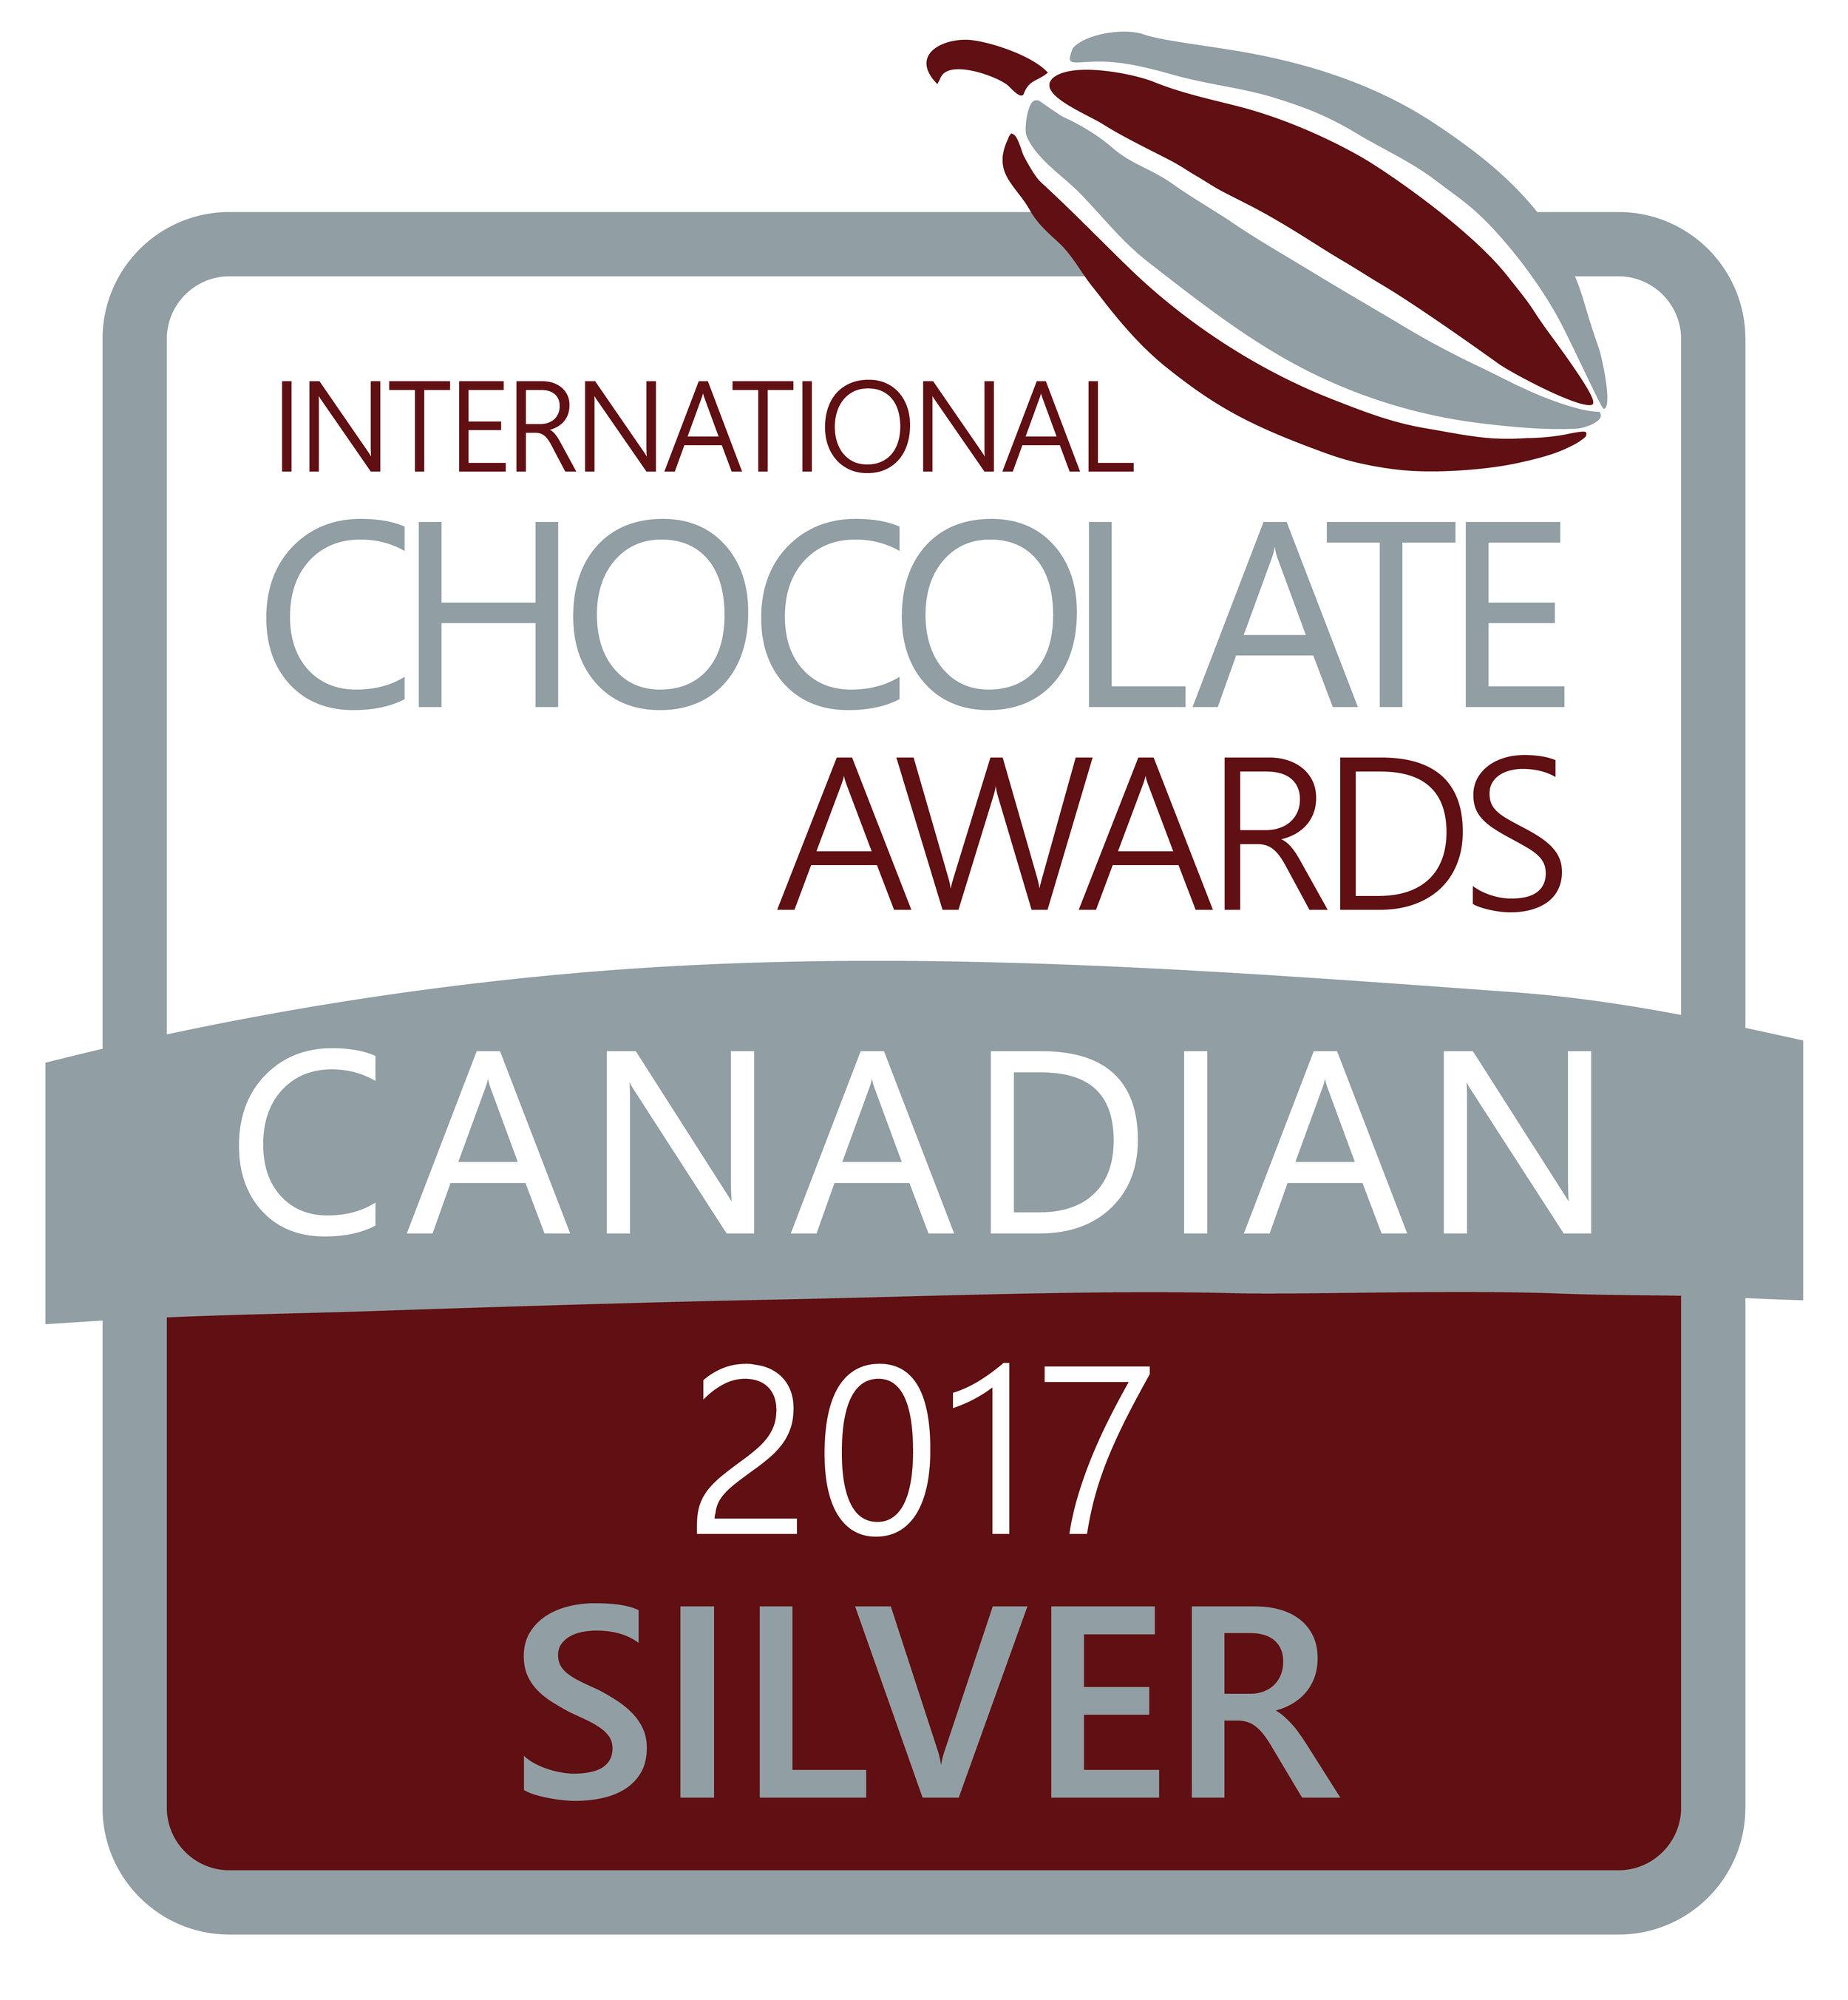 International Chocolate Award Silver Canada